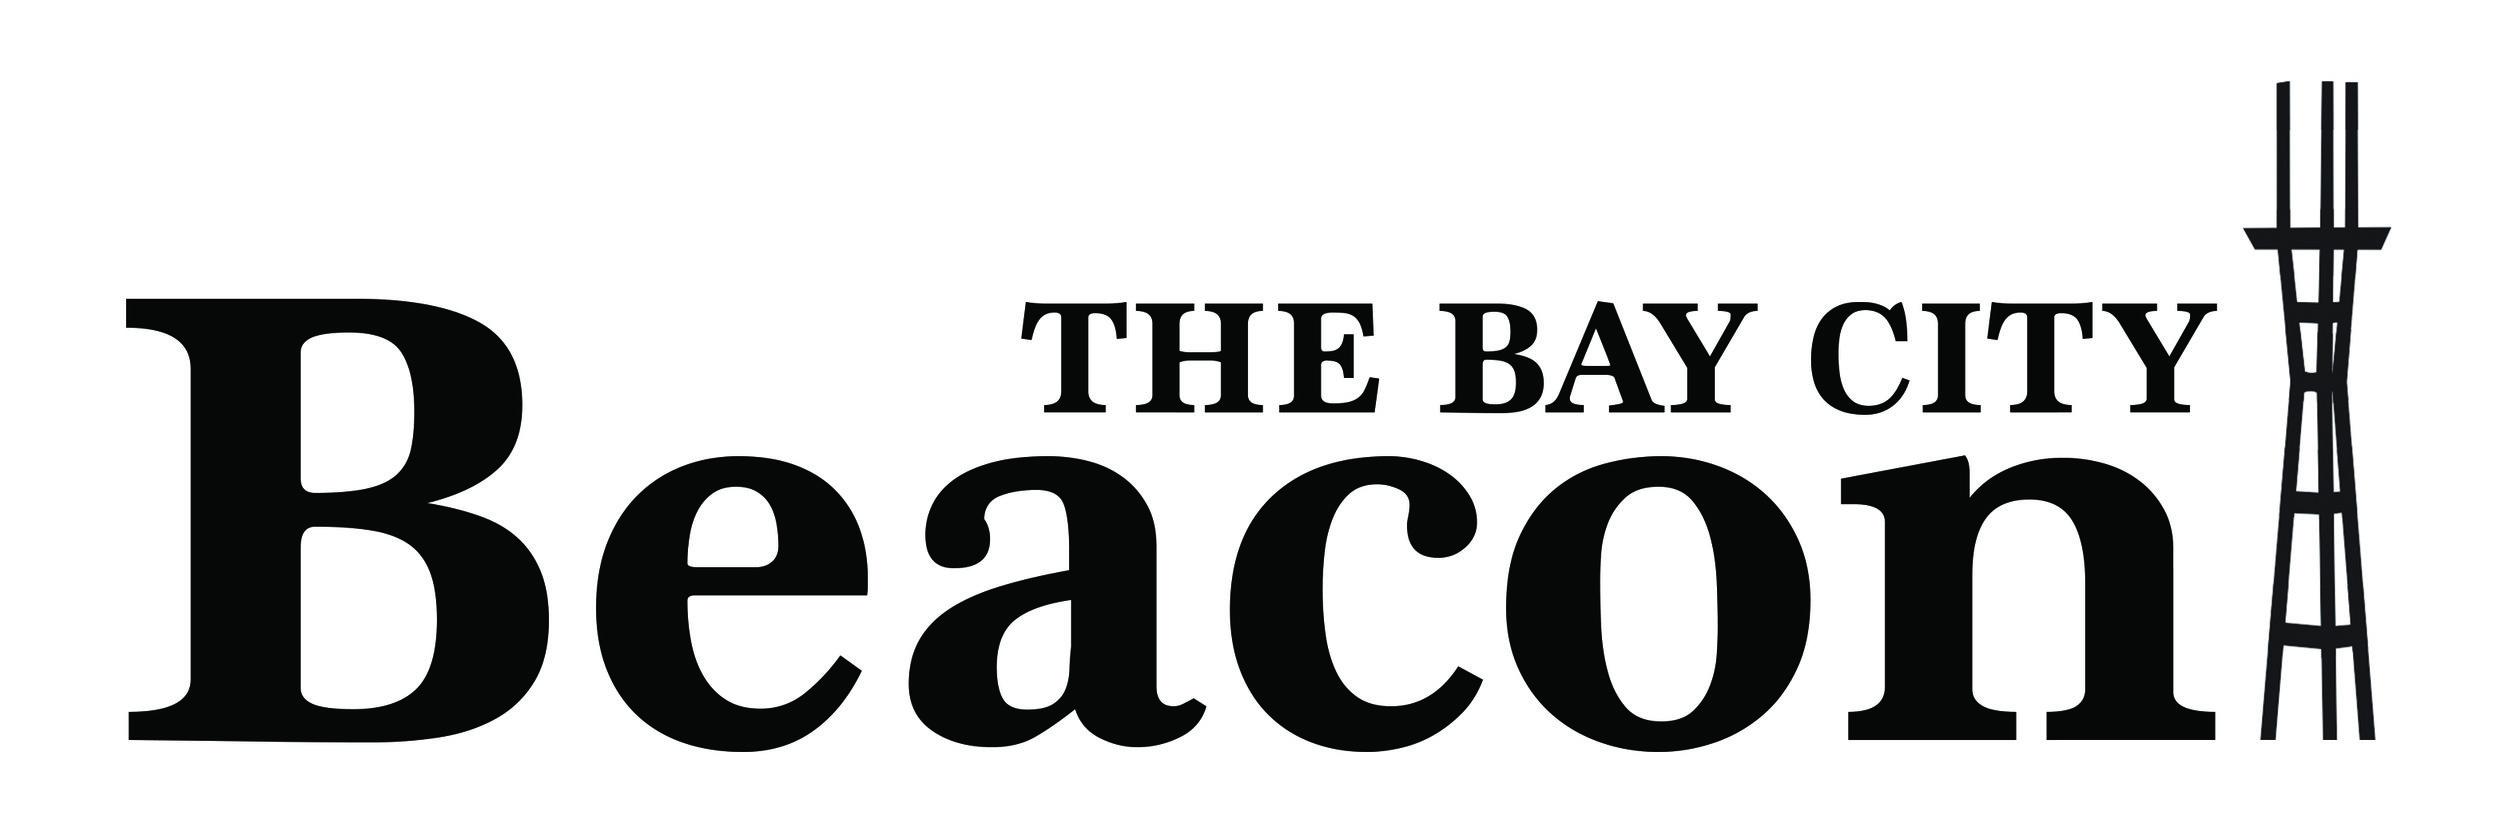 Topical Cannabis: Support your Neighborhood Cannabis Dispensaries | The Bay City Beacon | Aug 25, 2017